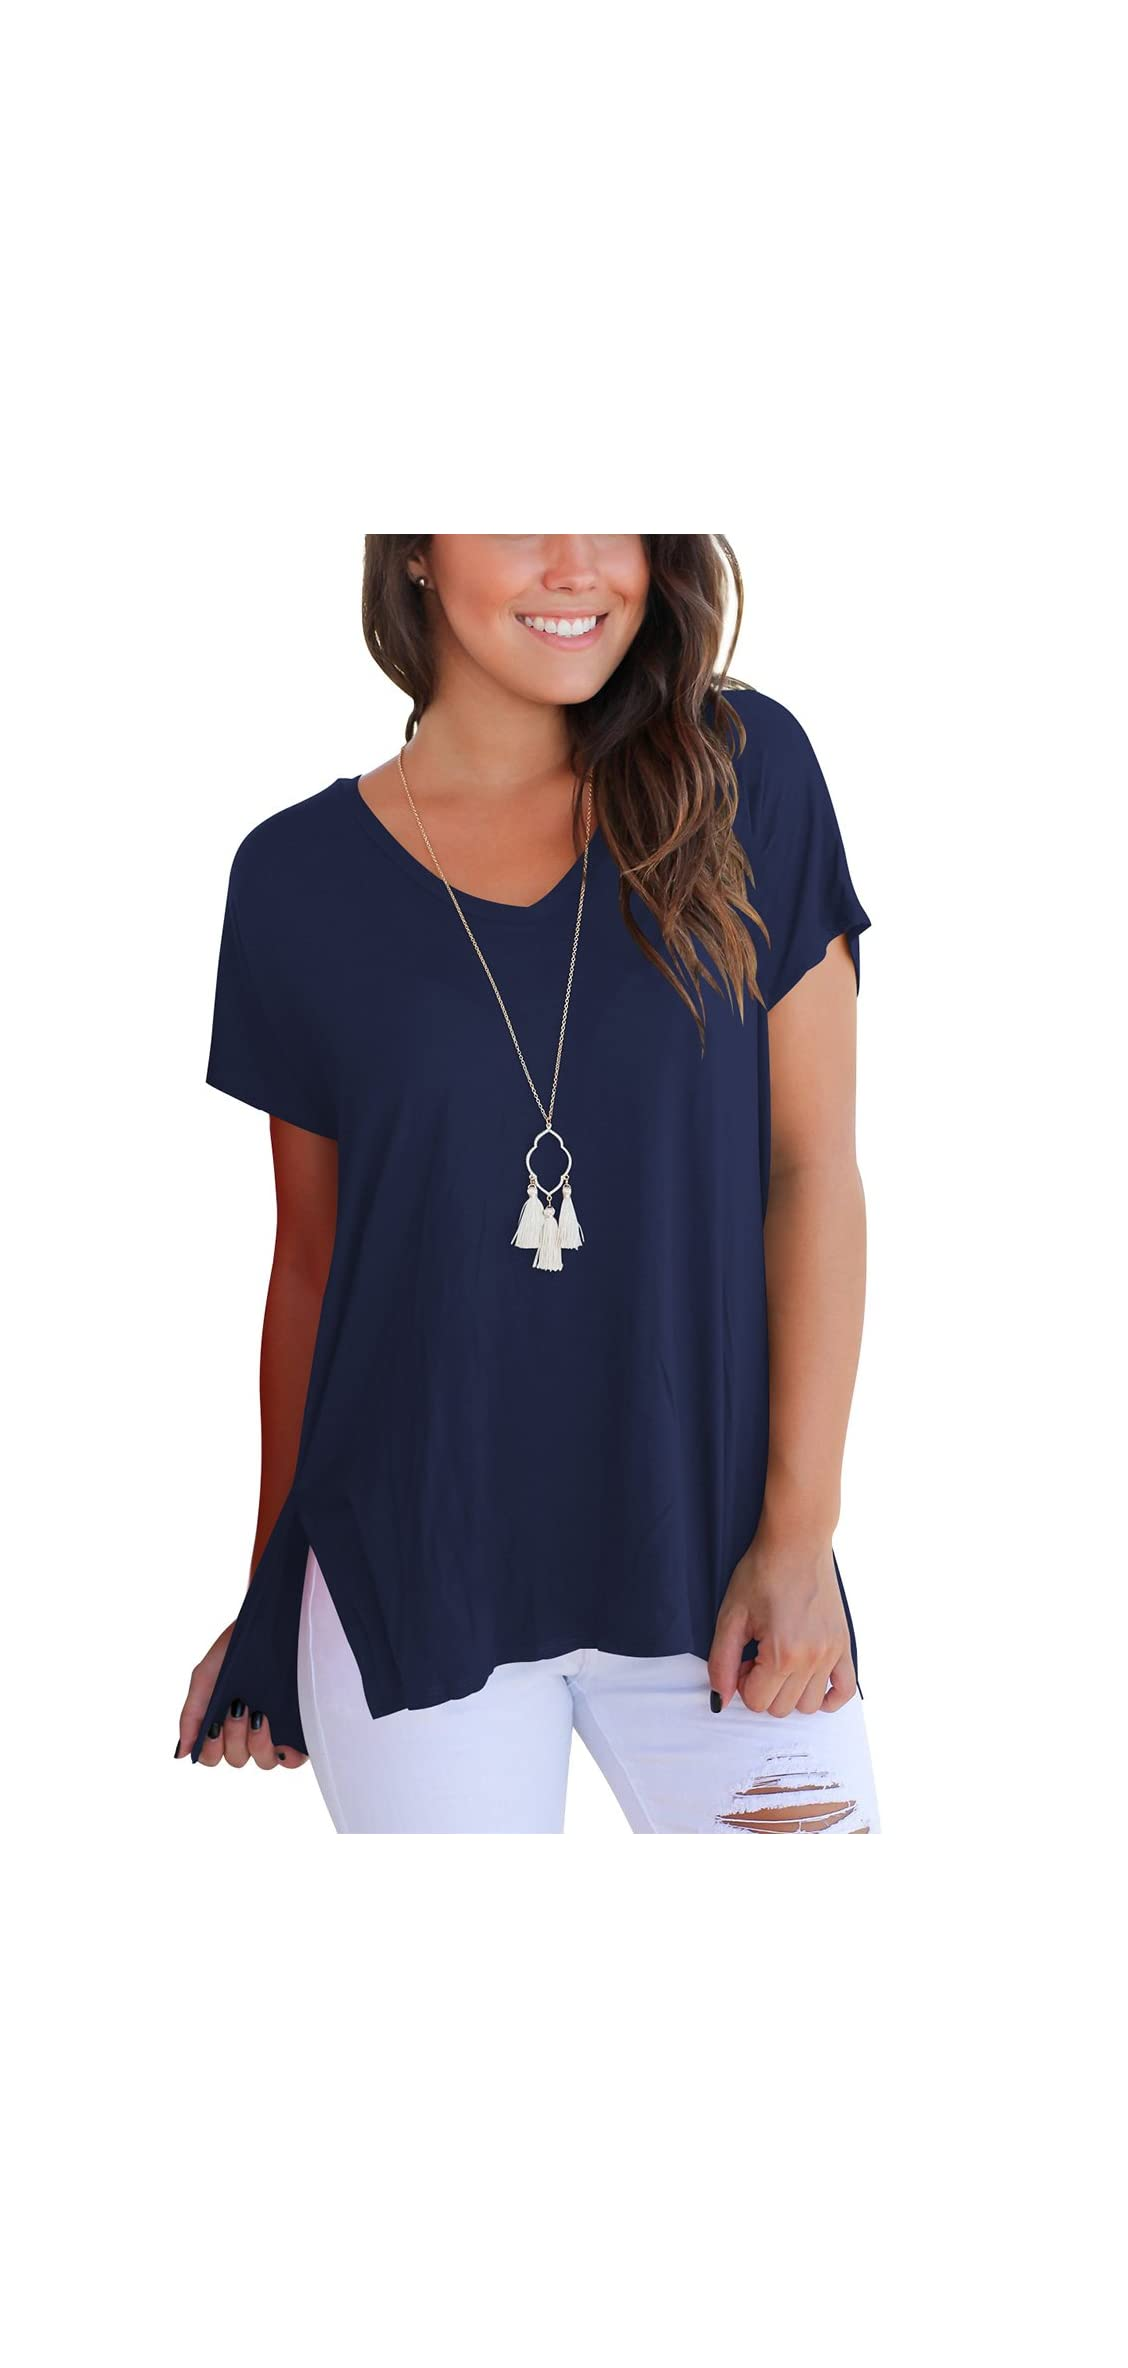 Women's Short Sleeve High Low Loose T Shirt Basic Tee